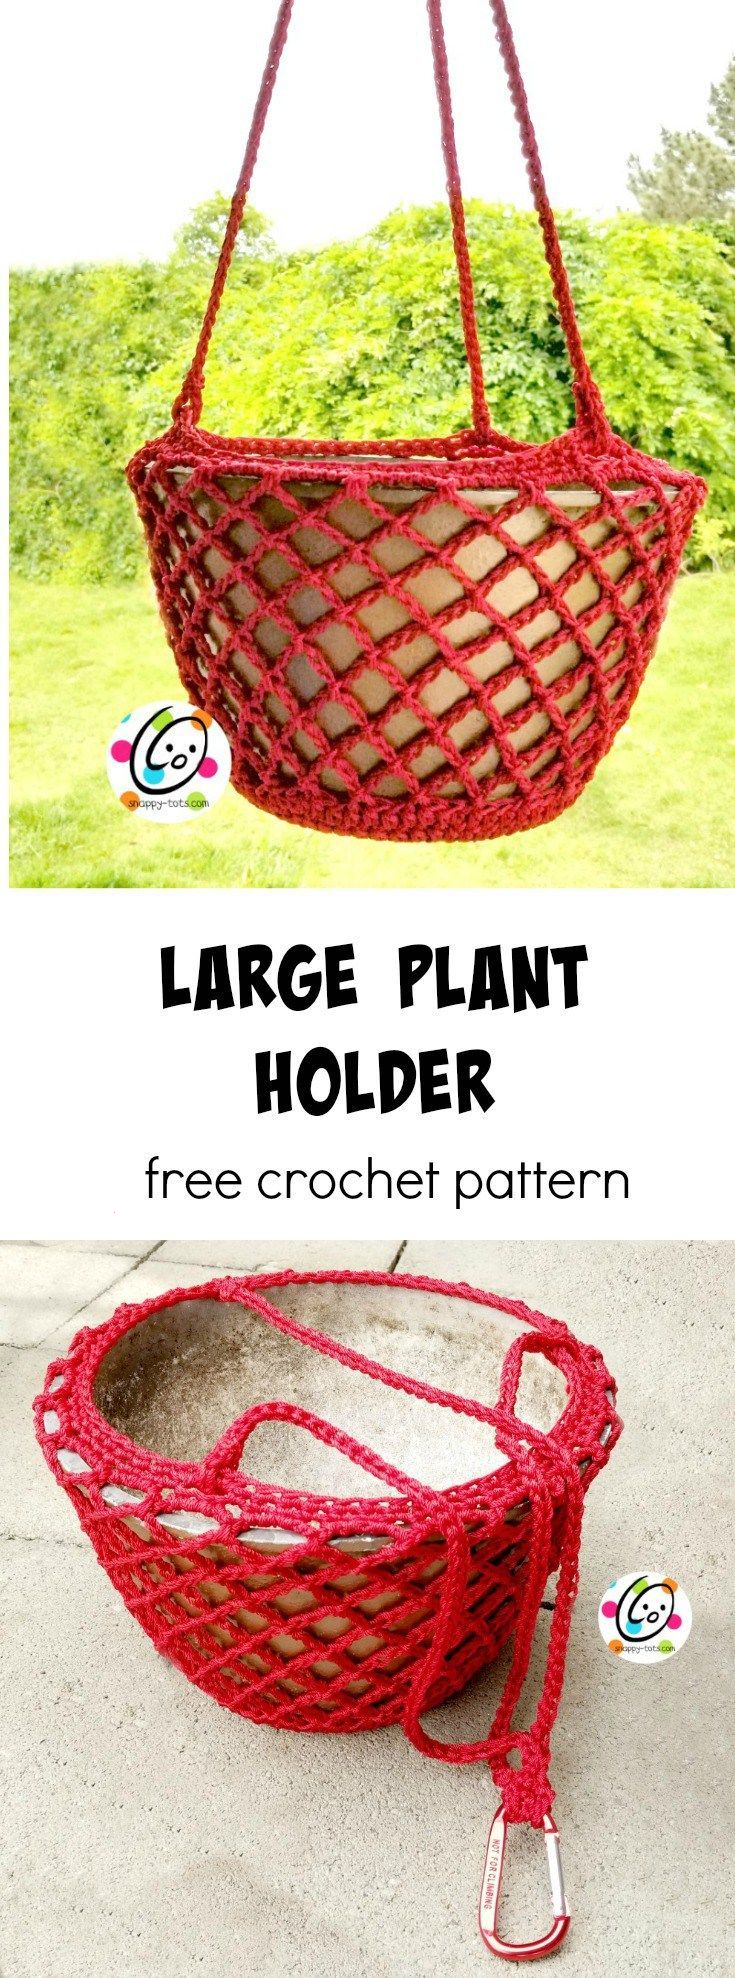 Free Pattern: Large Plant Holder